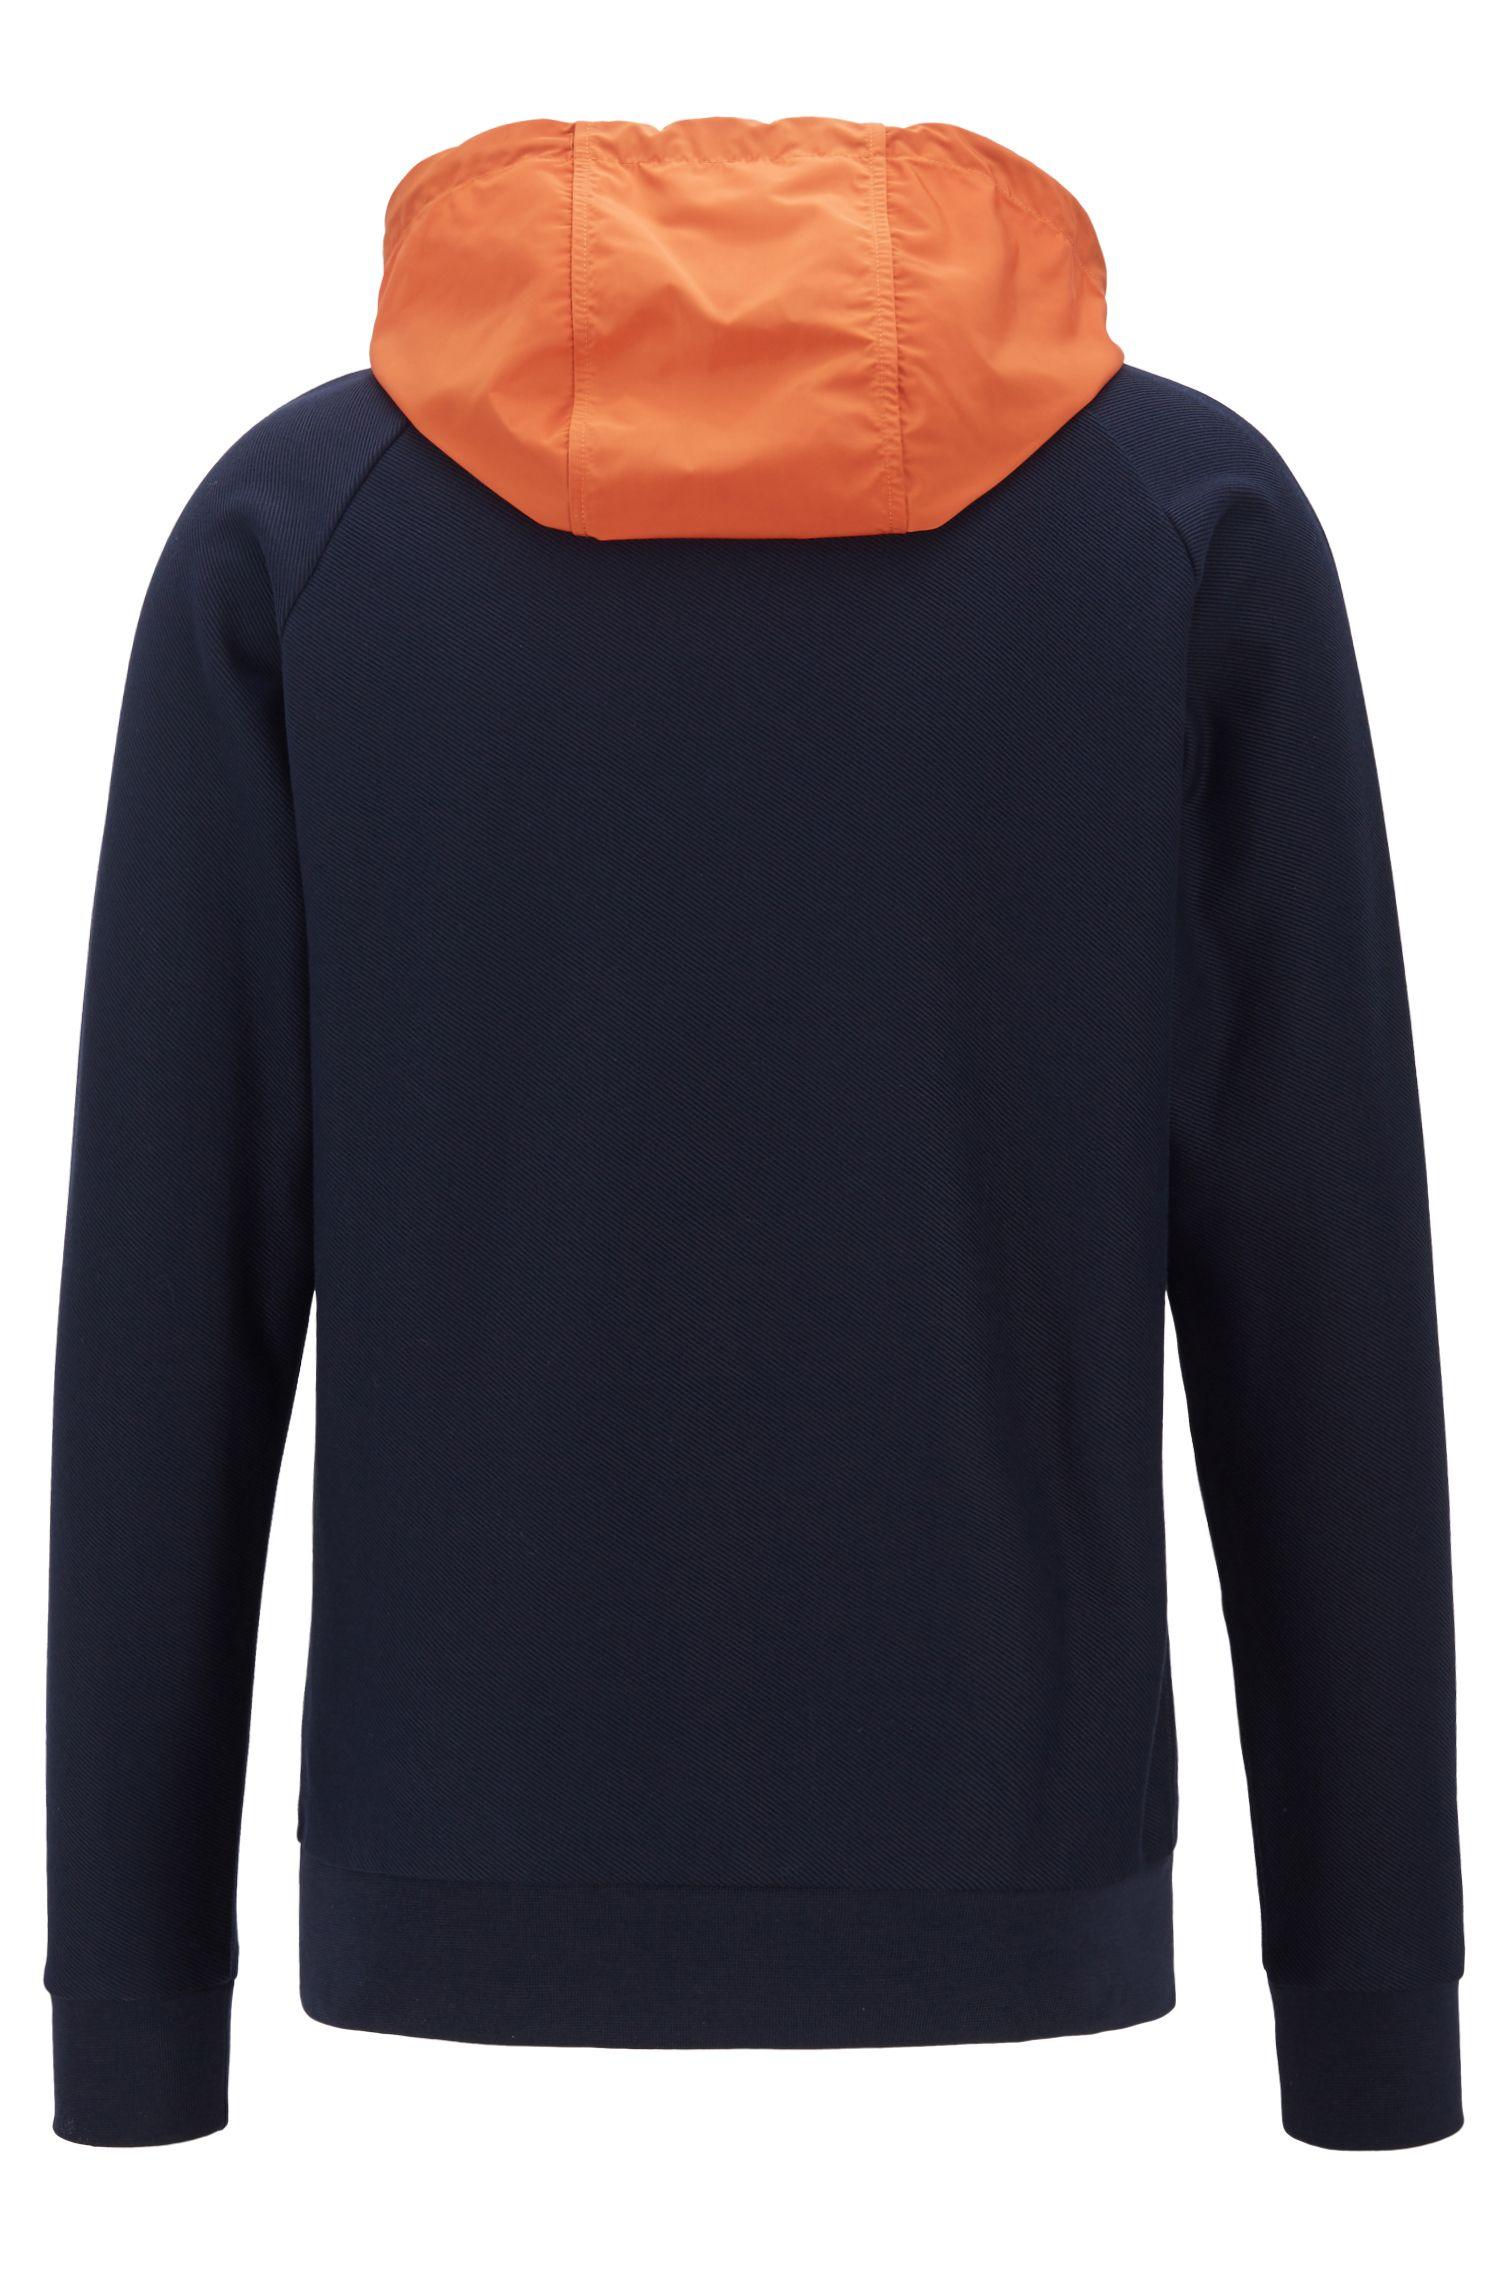 Hybrid sweatshirt with contrast detachable hood, Dark Blue